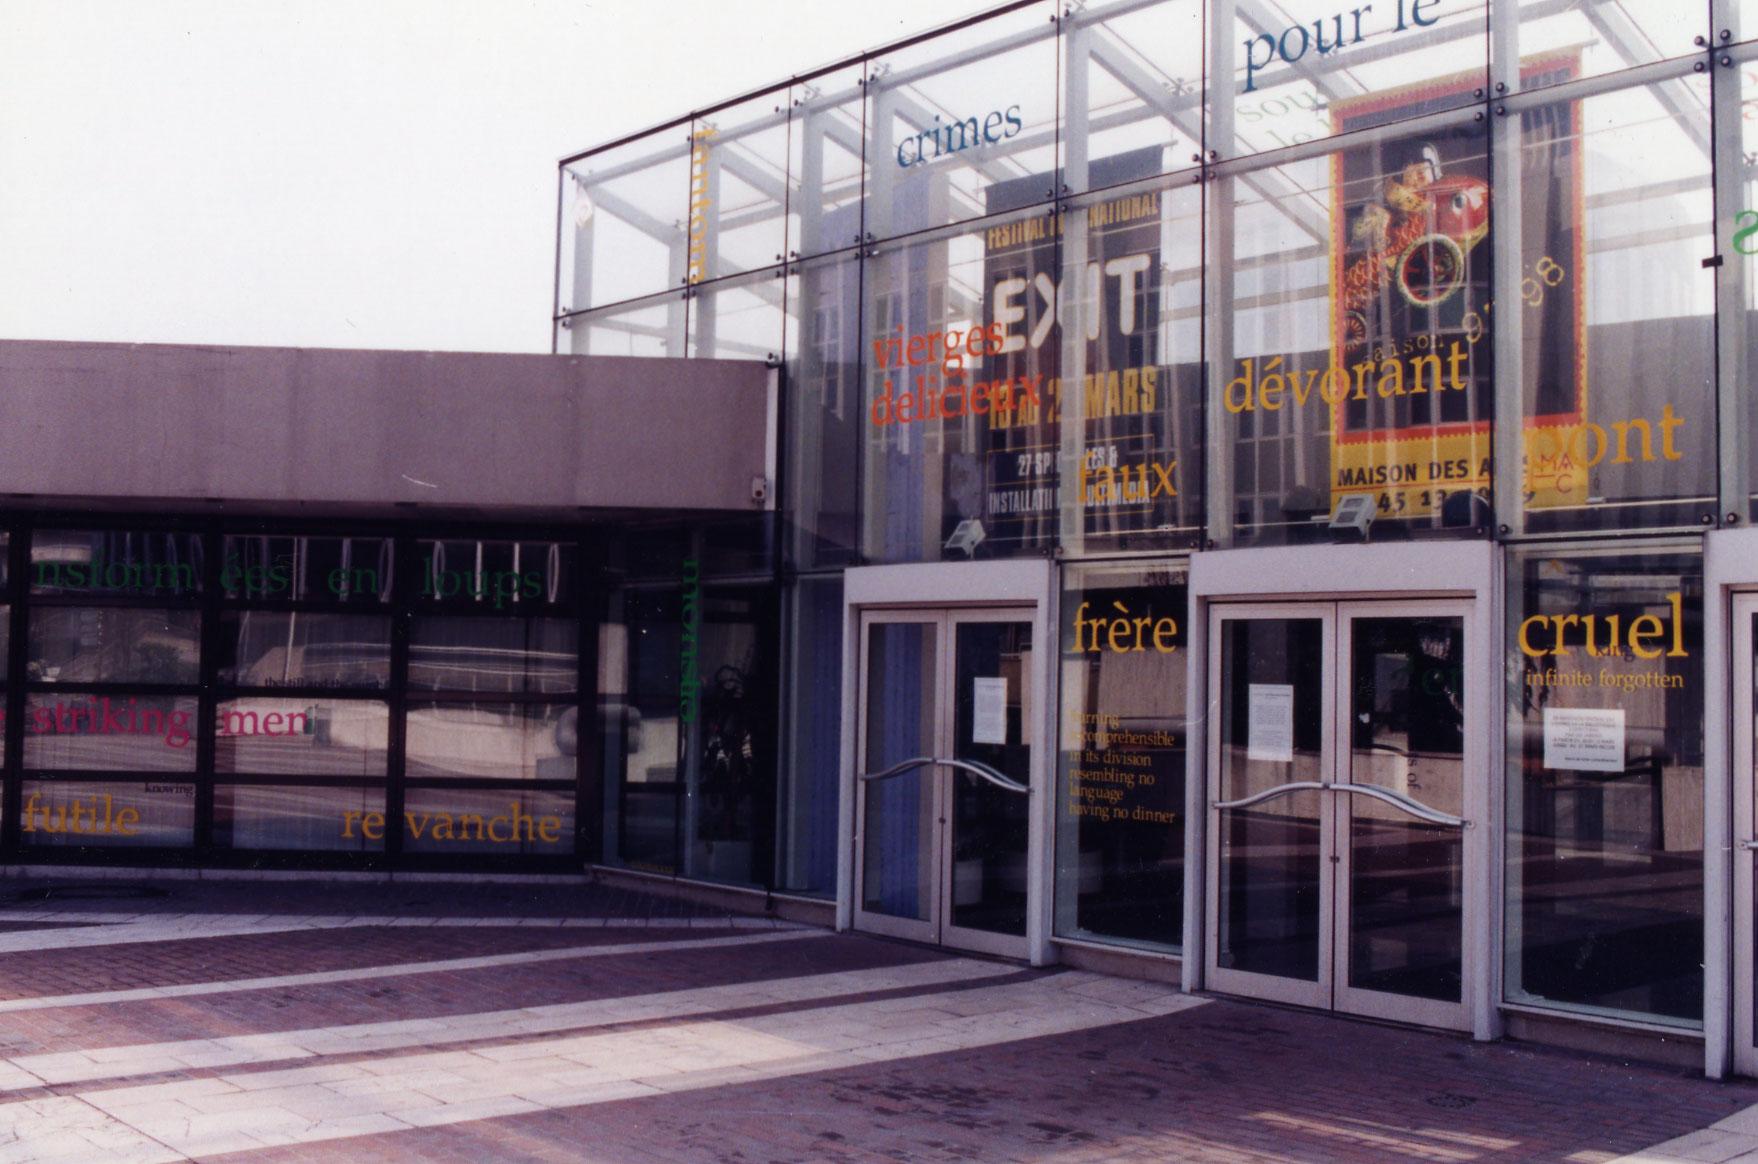 Créteil Installation, 1998 (1 of 2)